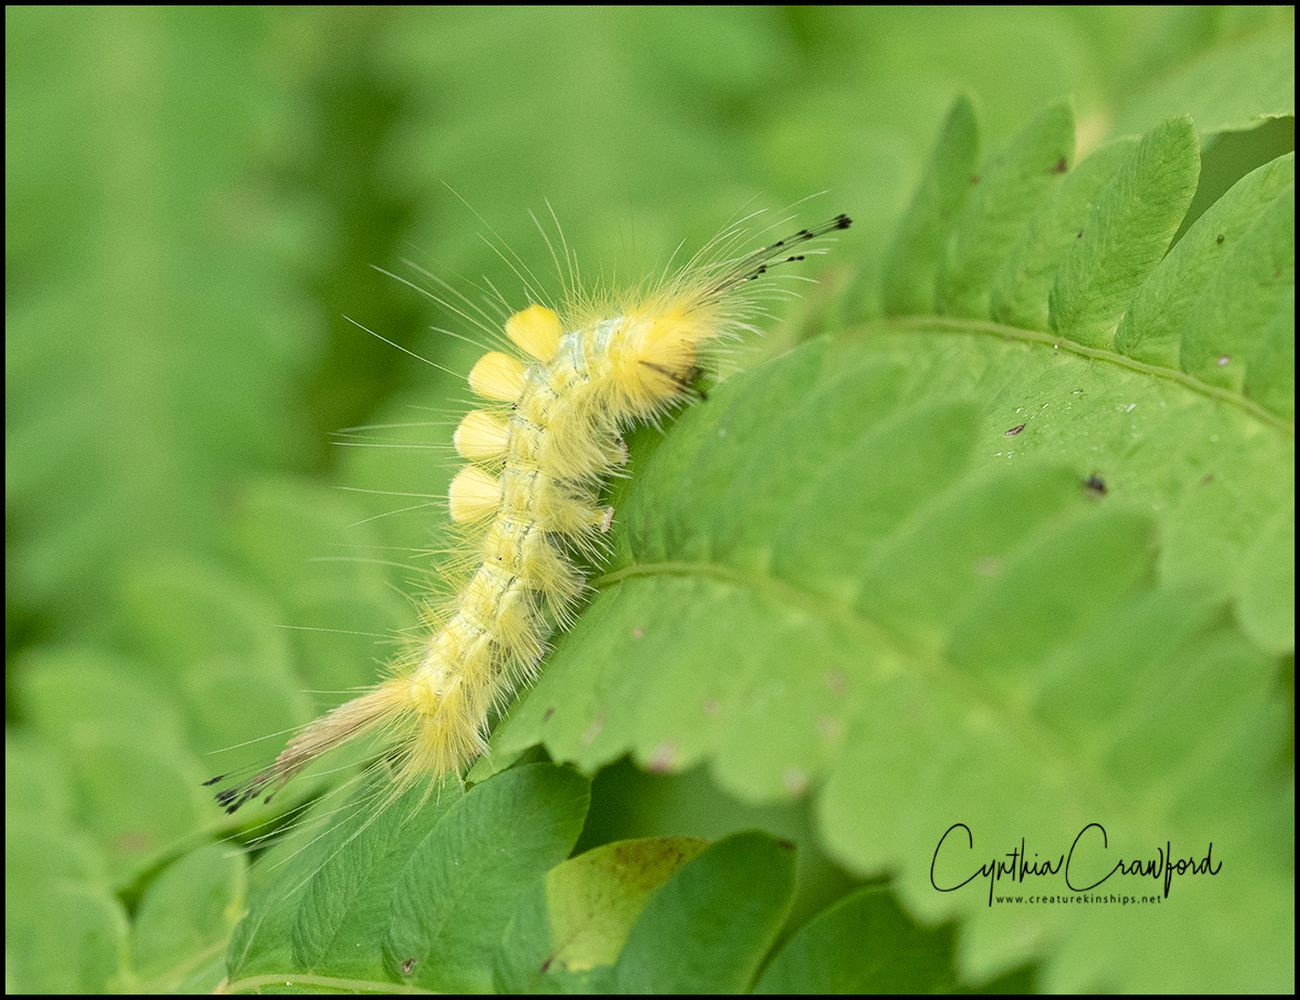 Definite Tussock Moth caterpillar